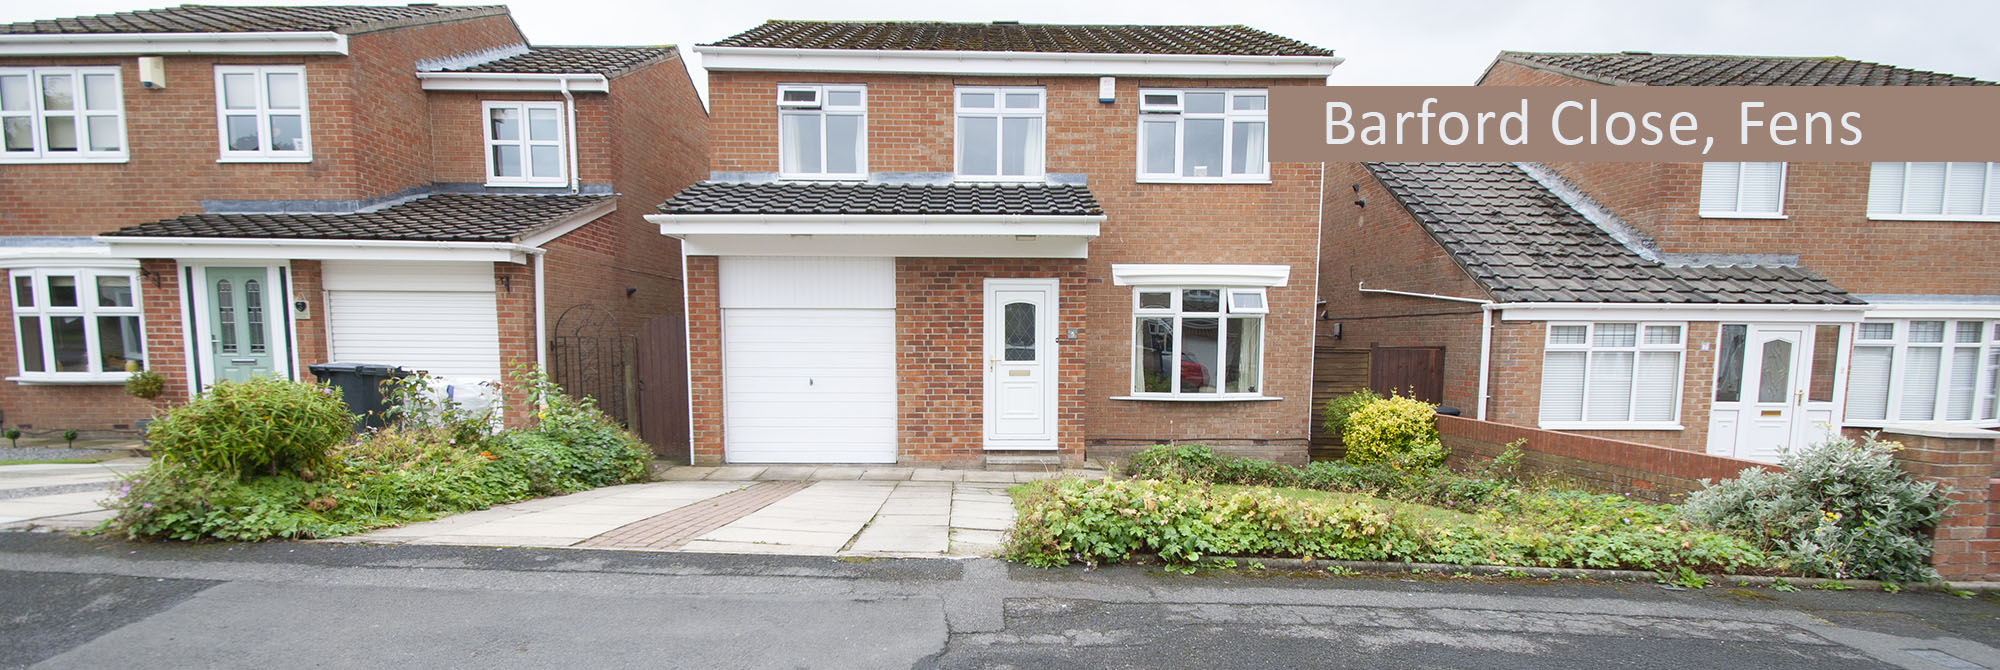 Barford Close, Fens, Hartlepool OIRO £195,000